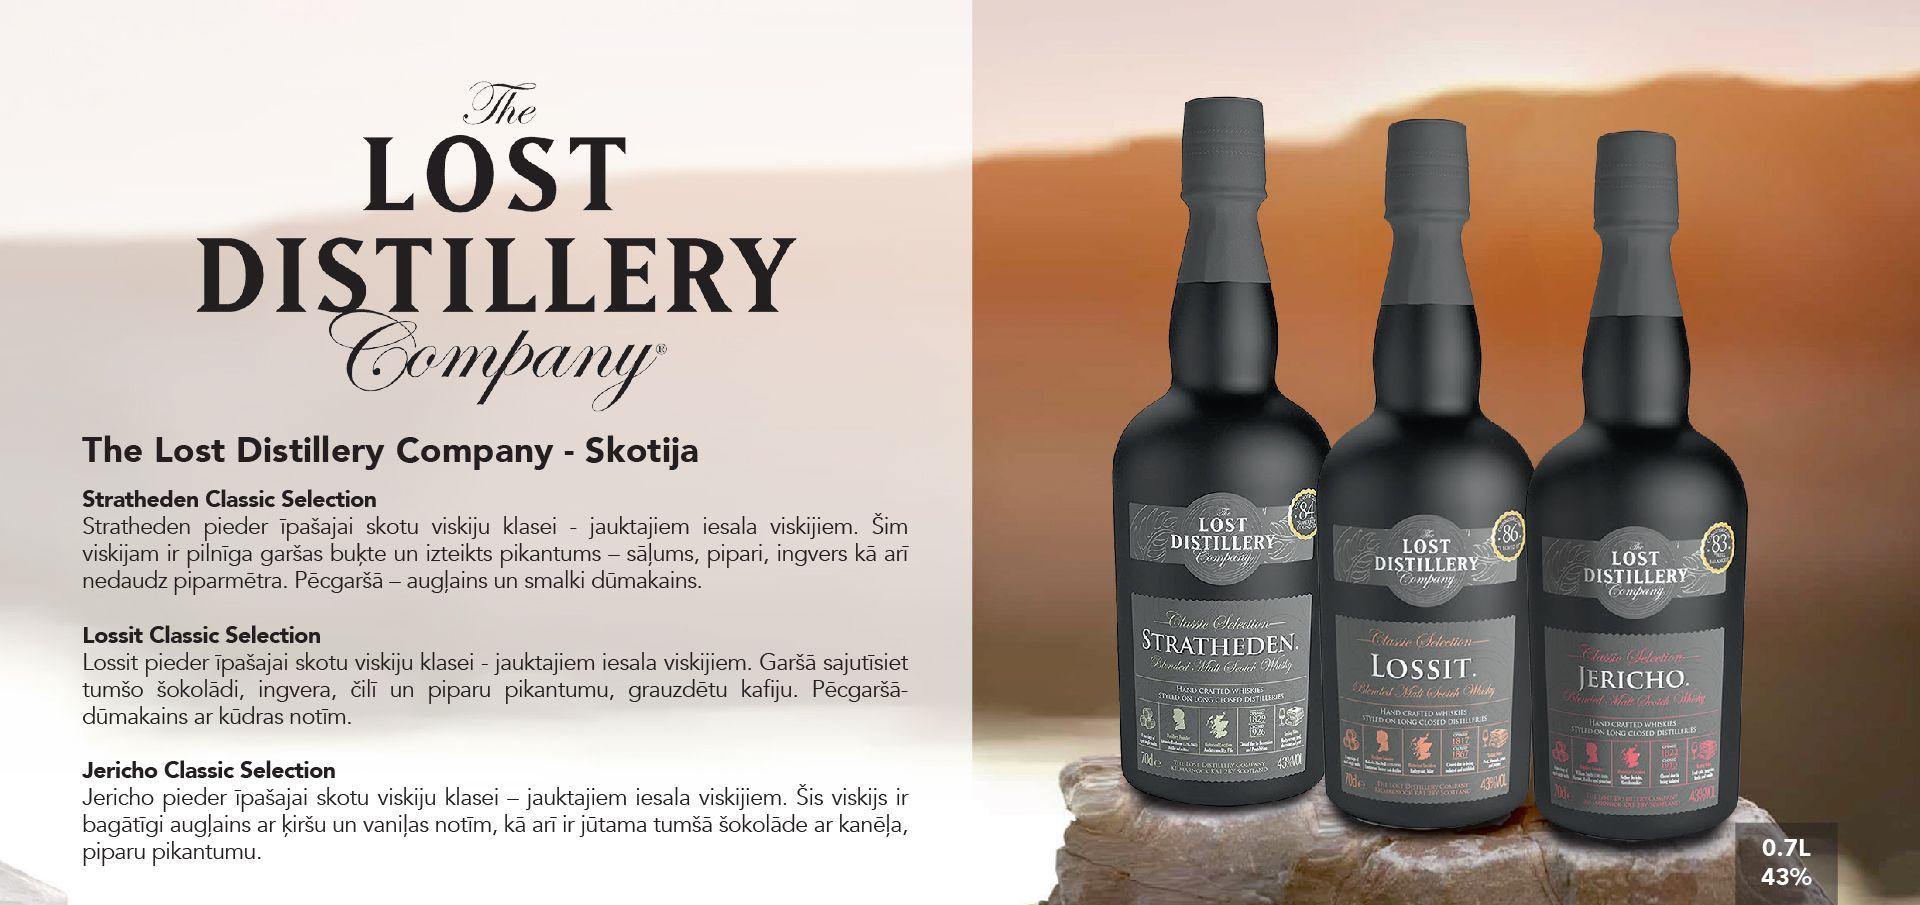 The Lost Distillery Company Whiskey - Skotija